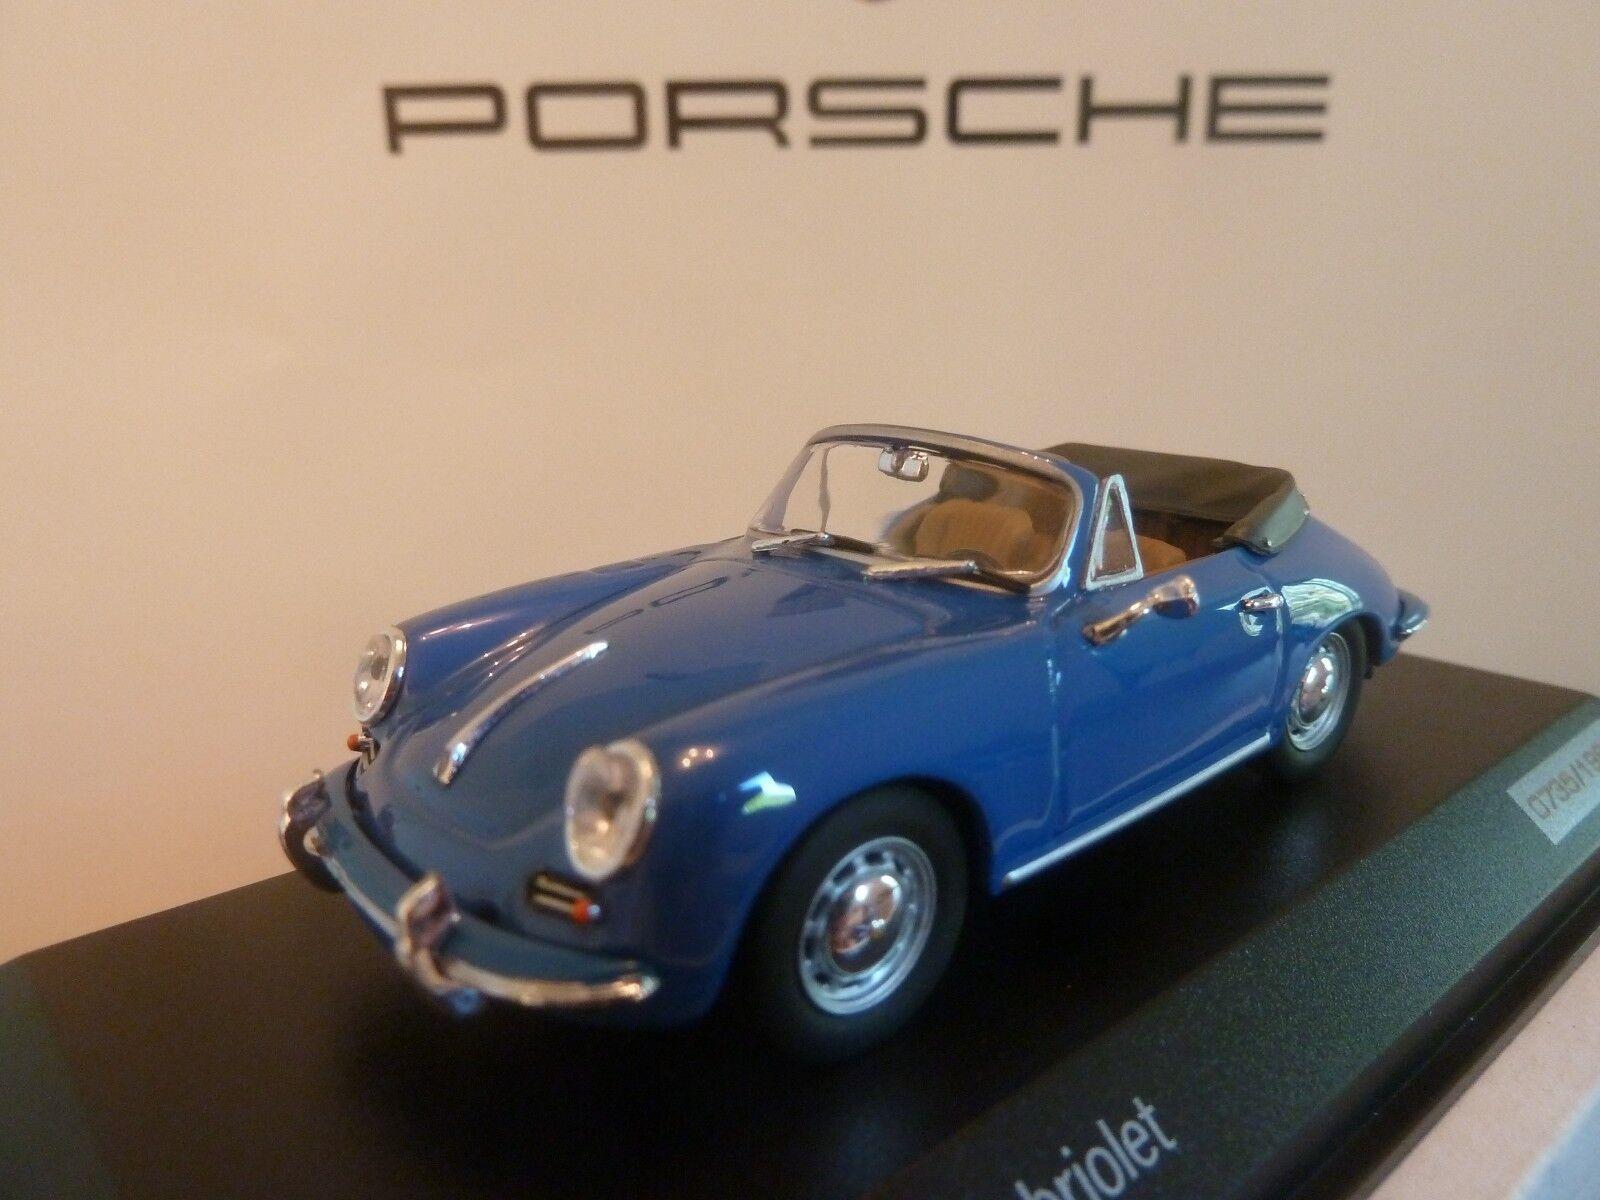 PORSCHE 356 Legends of 1963 Limited edition